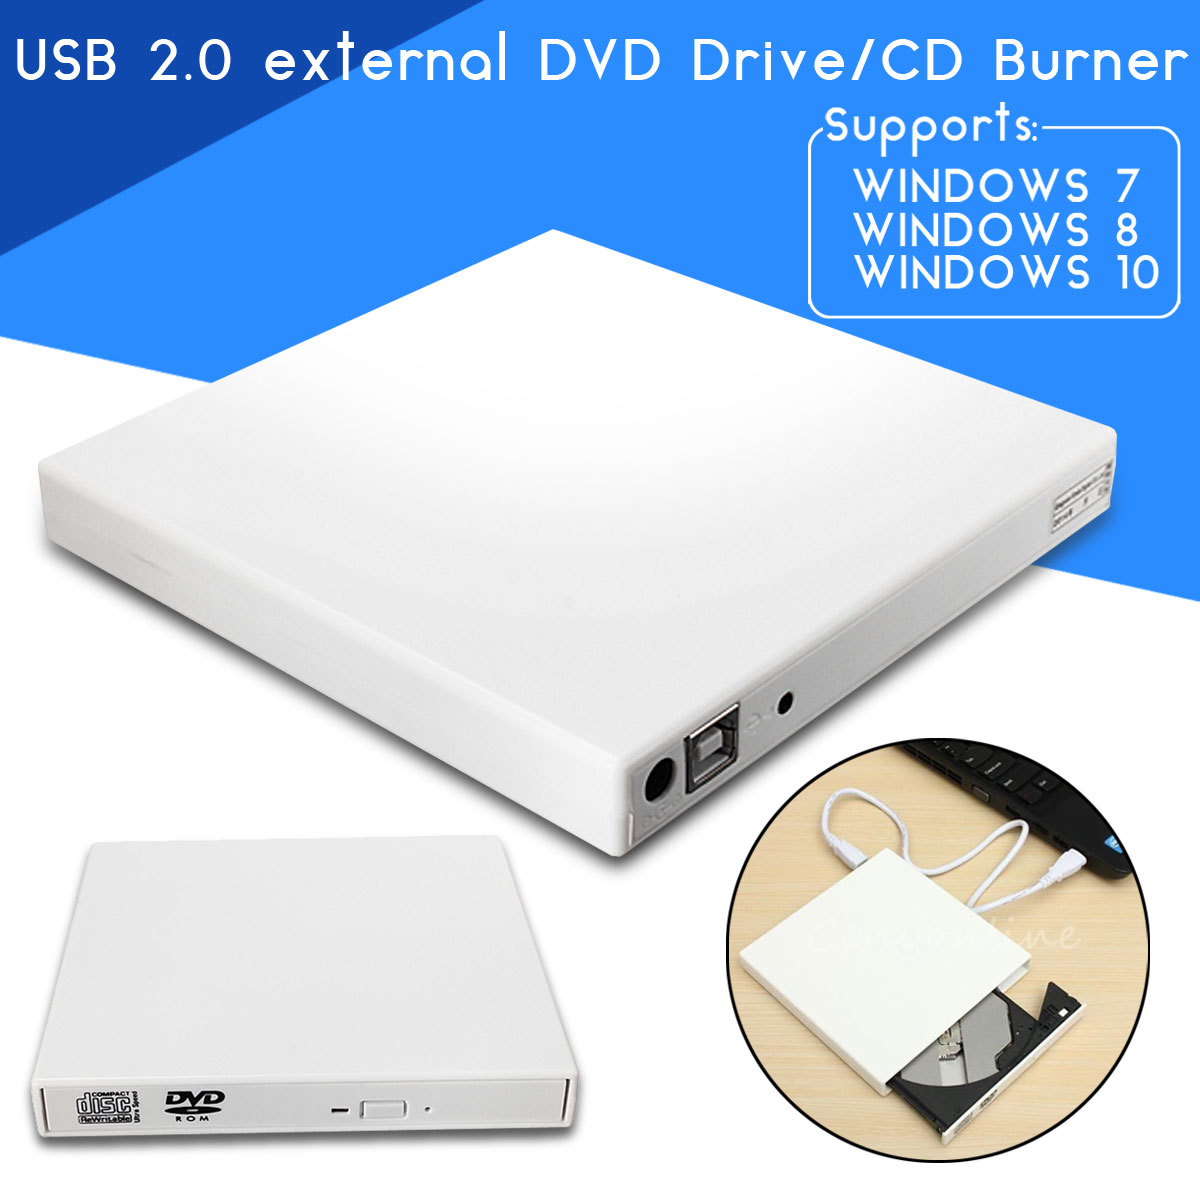 USB 2 0 External Combo Optical Drive CD/DVD Player Burner for PC -  Shoppingsquare Australia